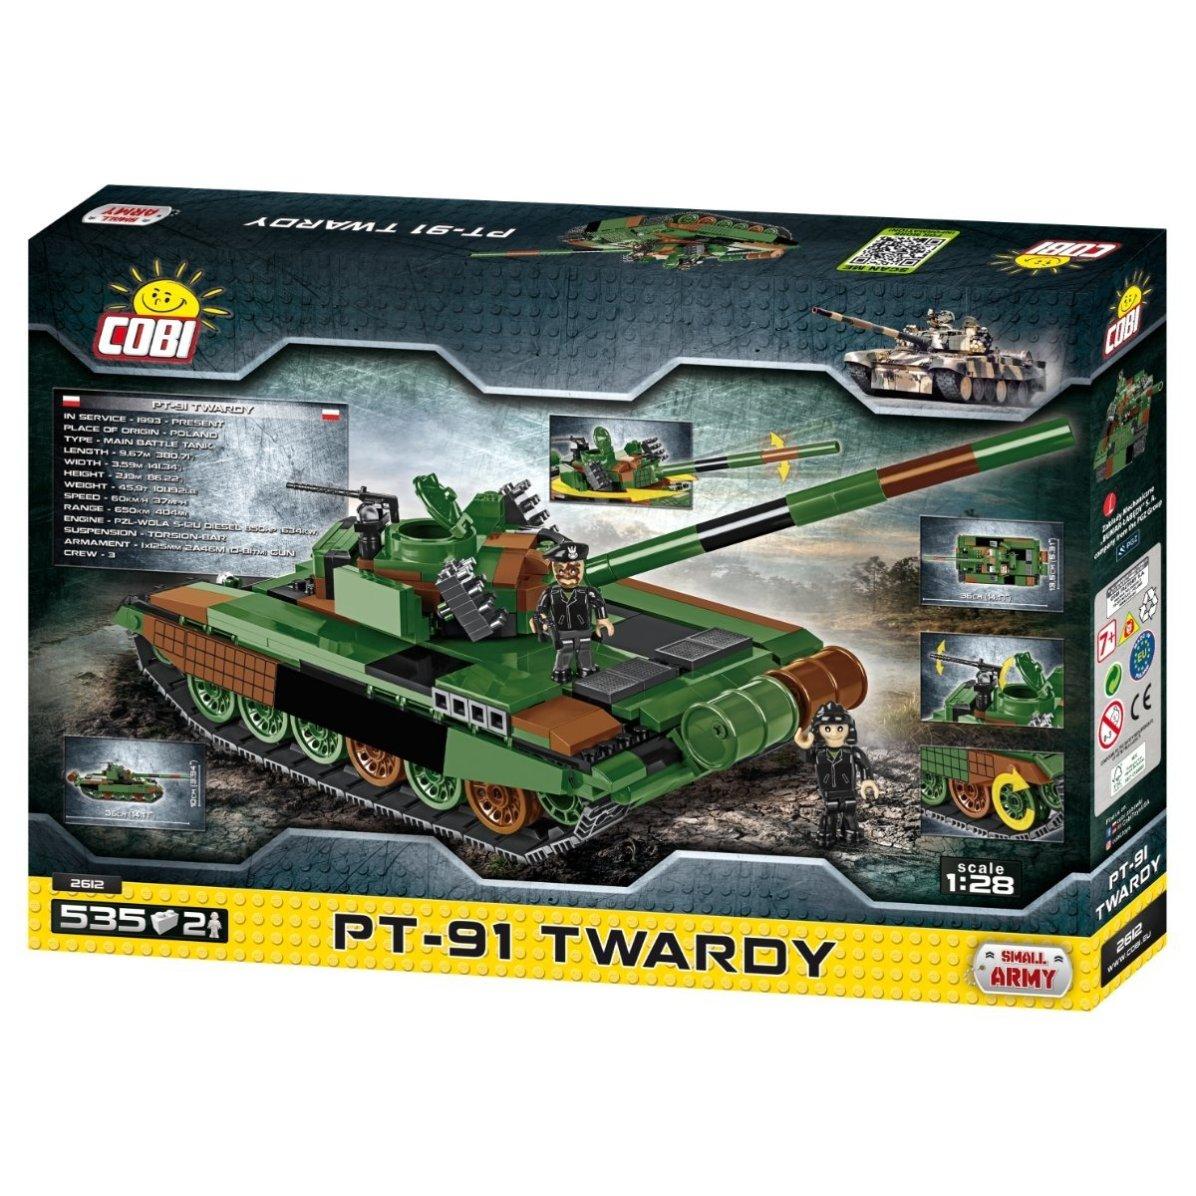 Cobi Polish PT-91 TWARDY Tank Set (2612) Amazon